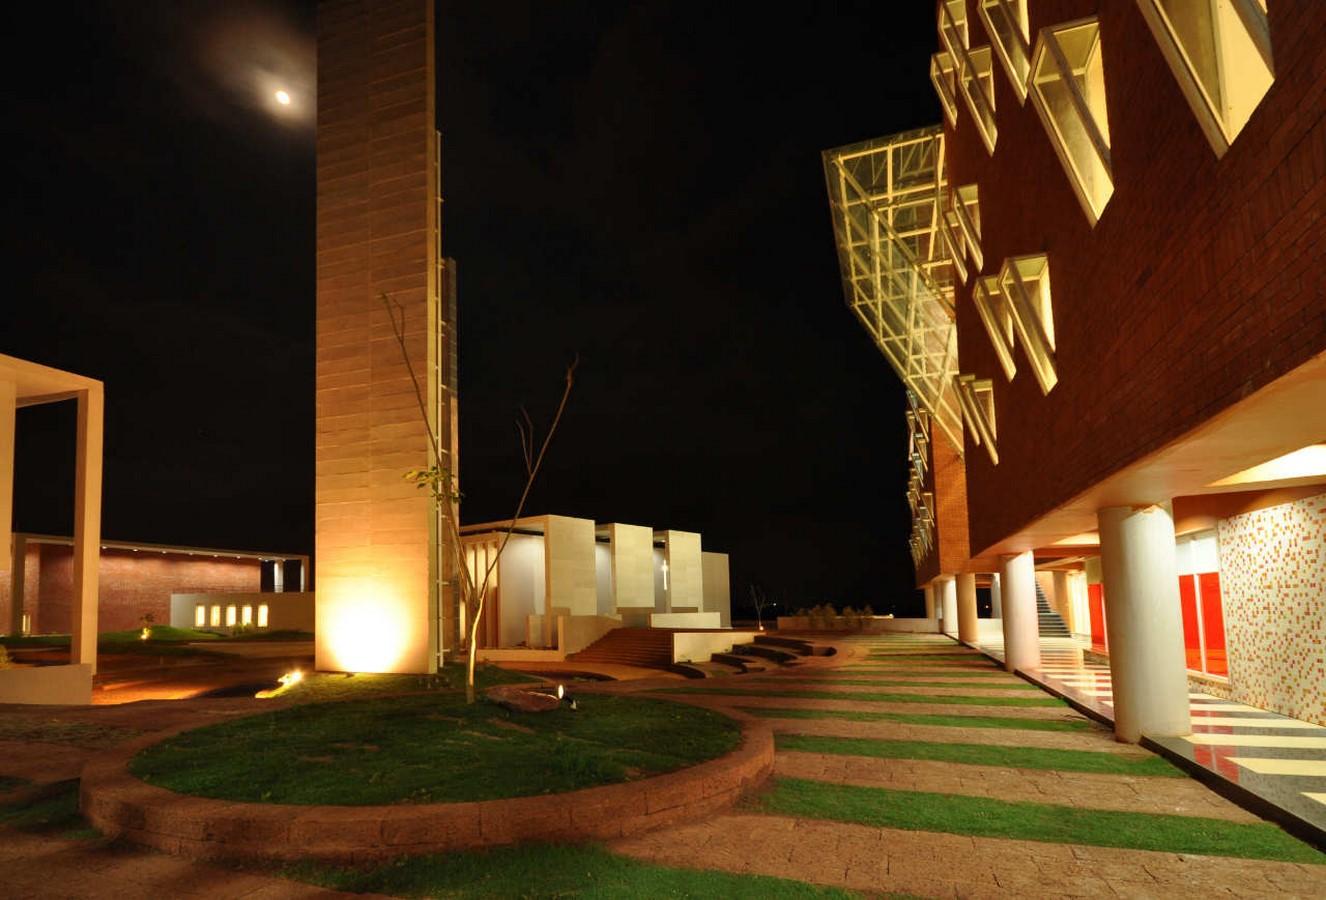 International Management Institute, Bhubaneshwar, Orissa - Sheet3